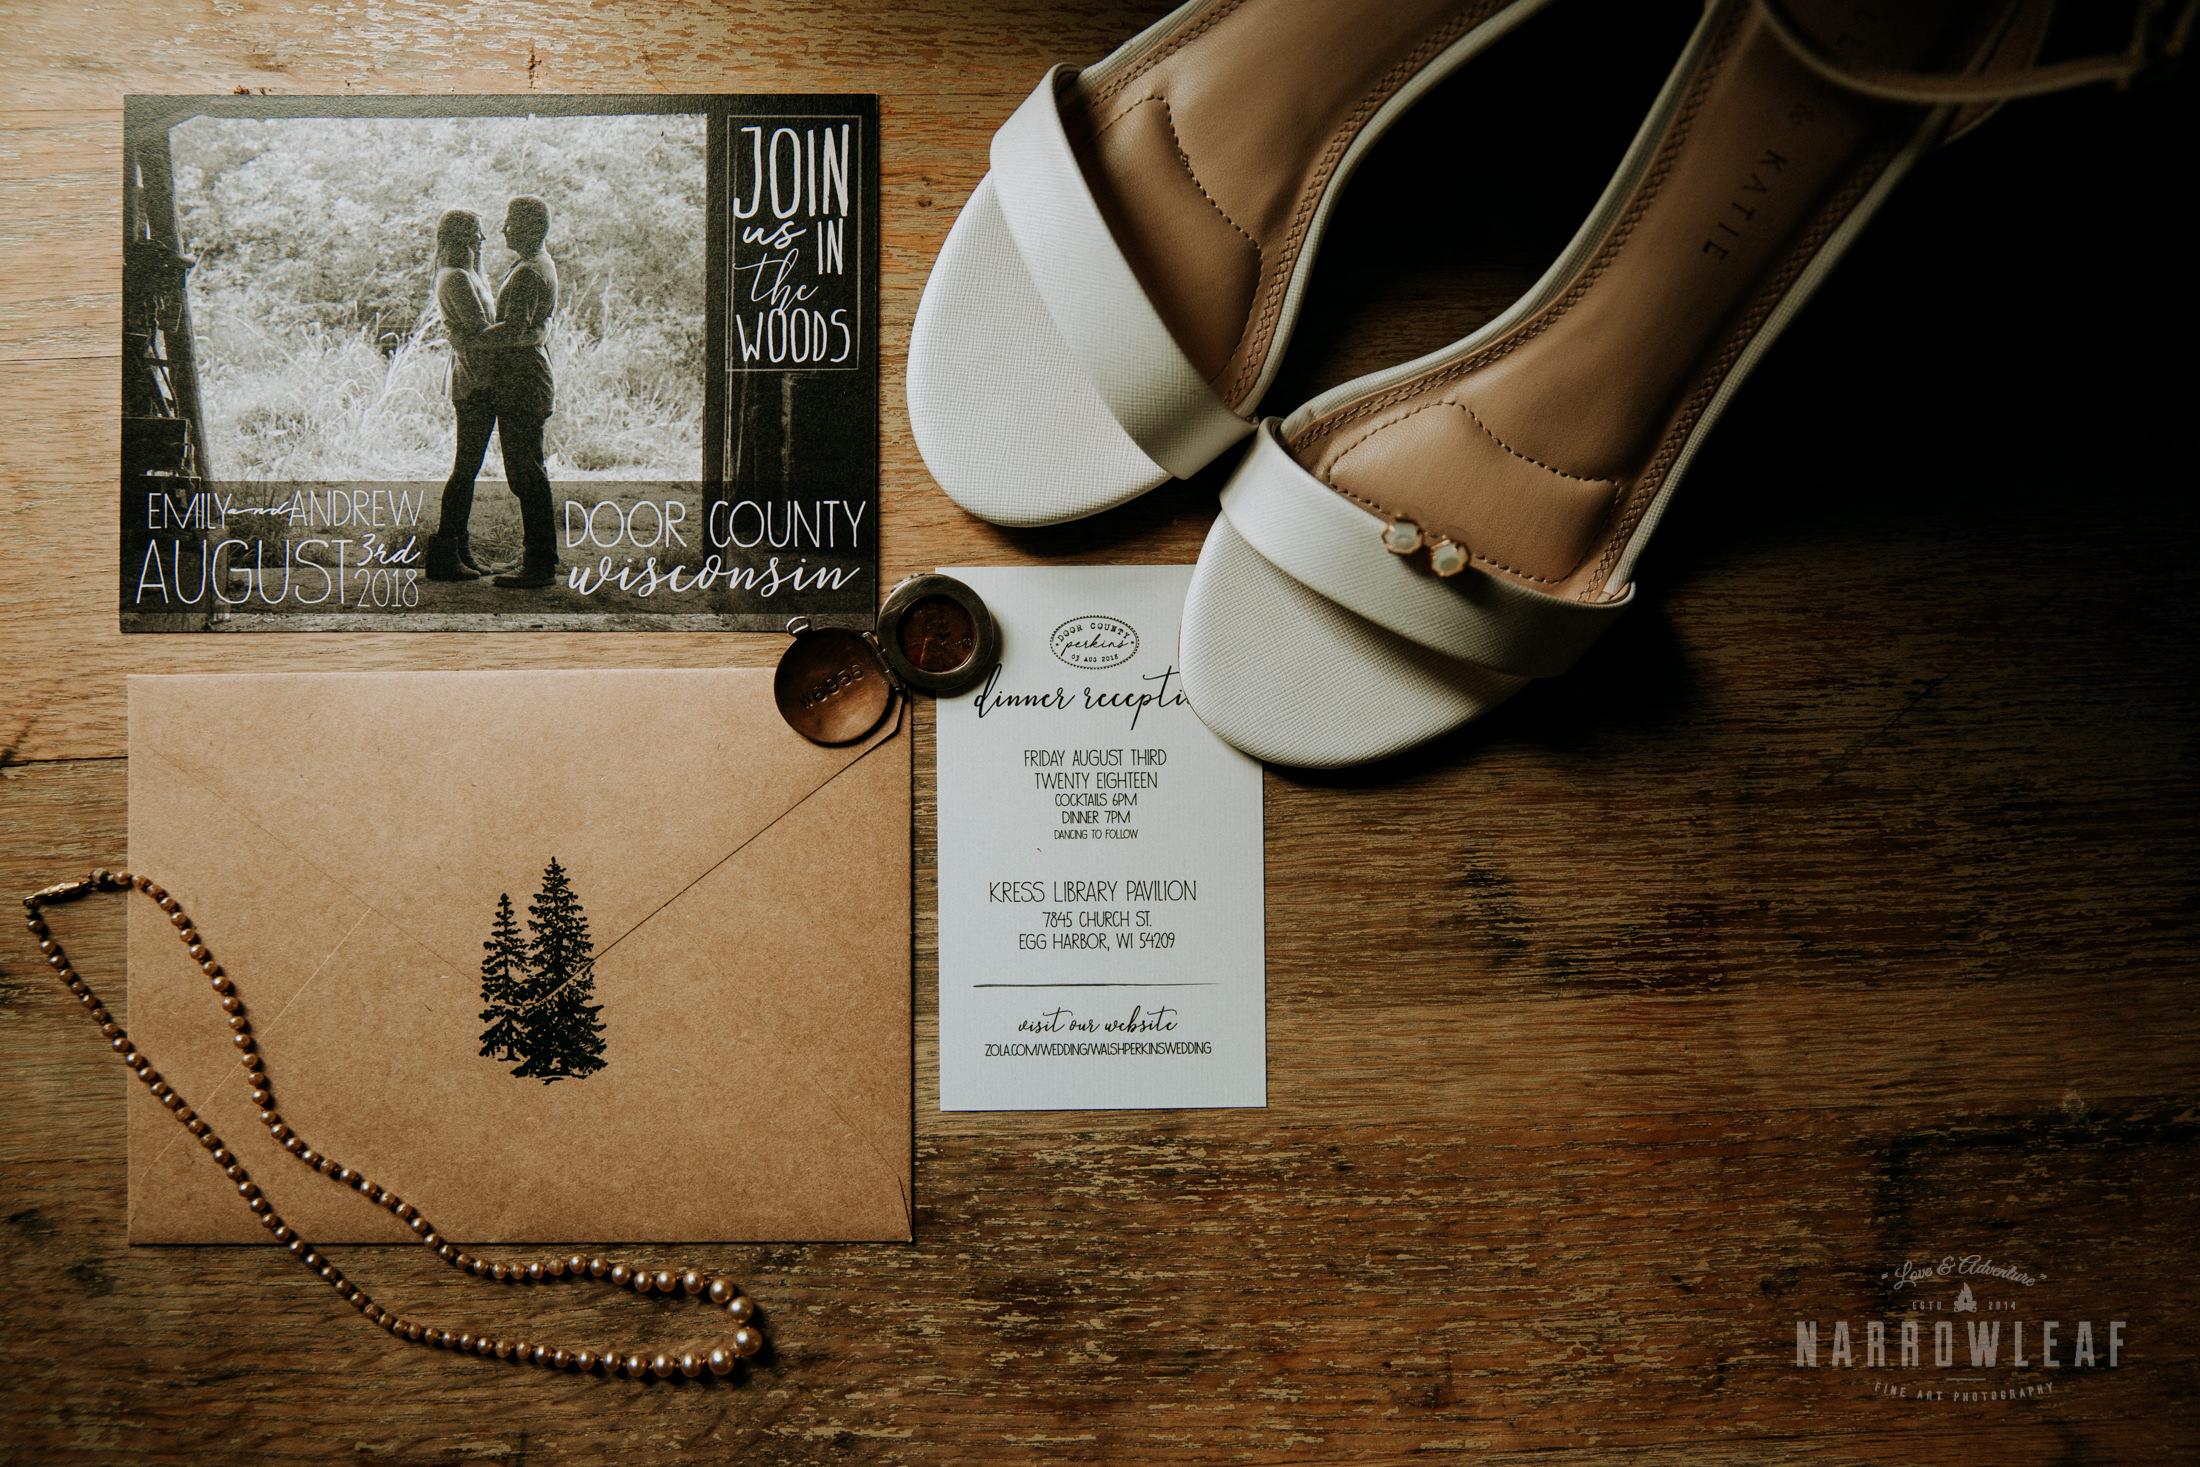 door-county-wedding-photographer-in-the-woods-Narrowleaf_Love_and_Adventure_Photography-7214.jpg